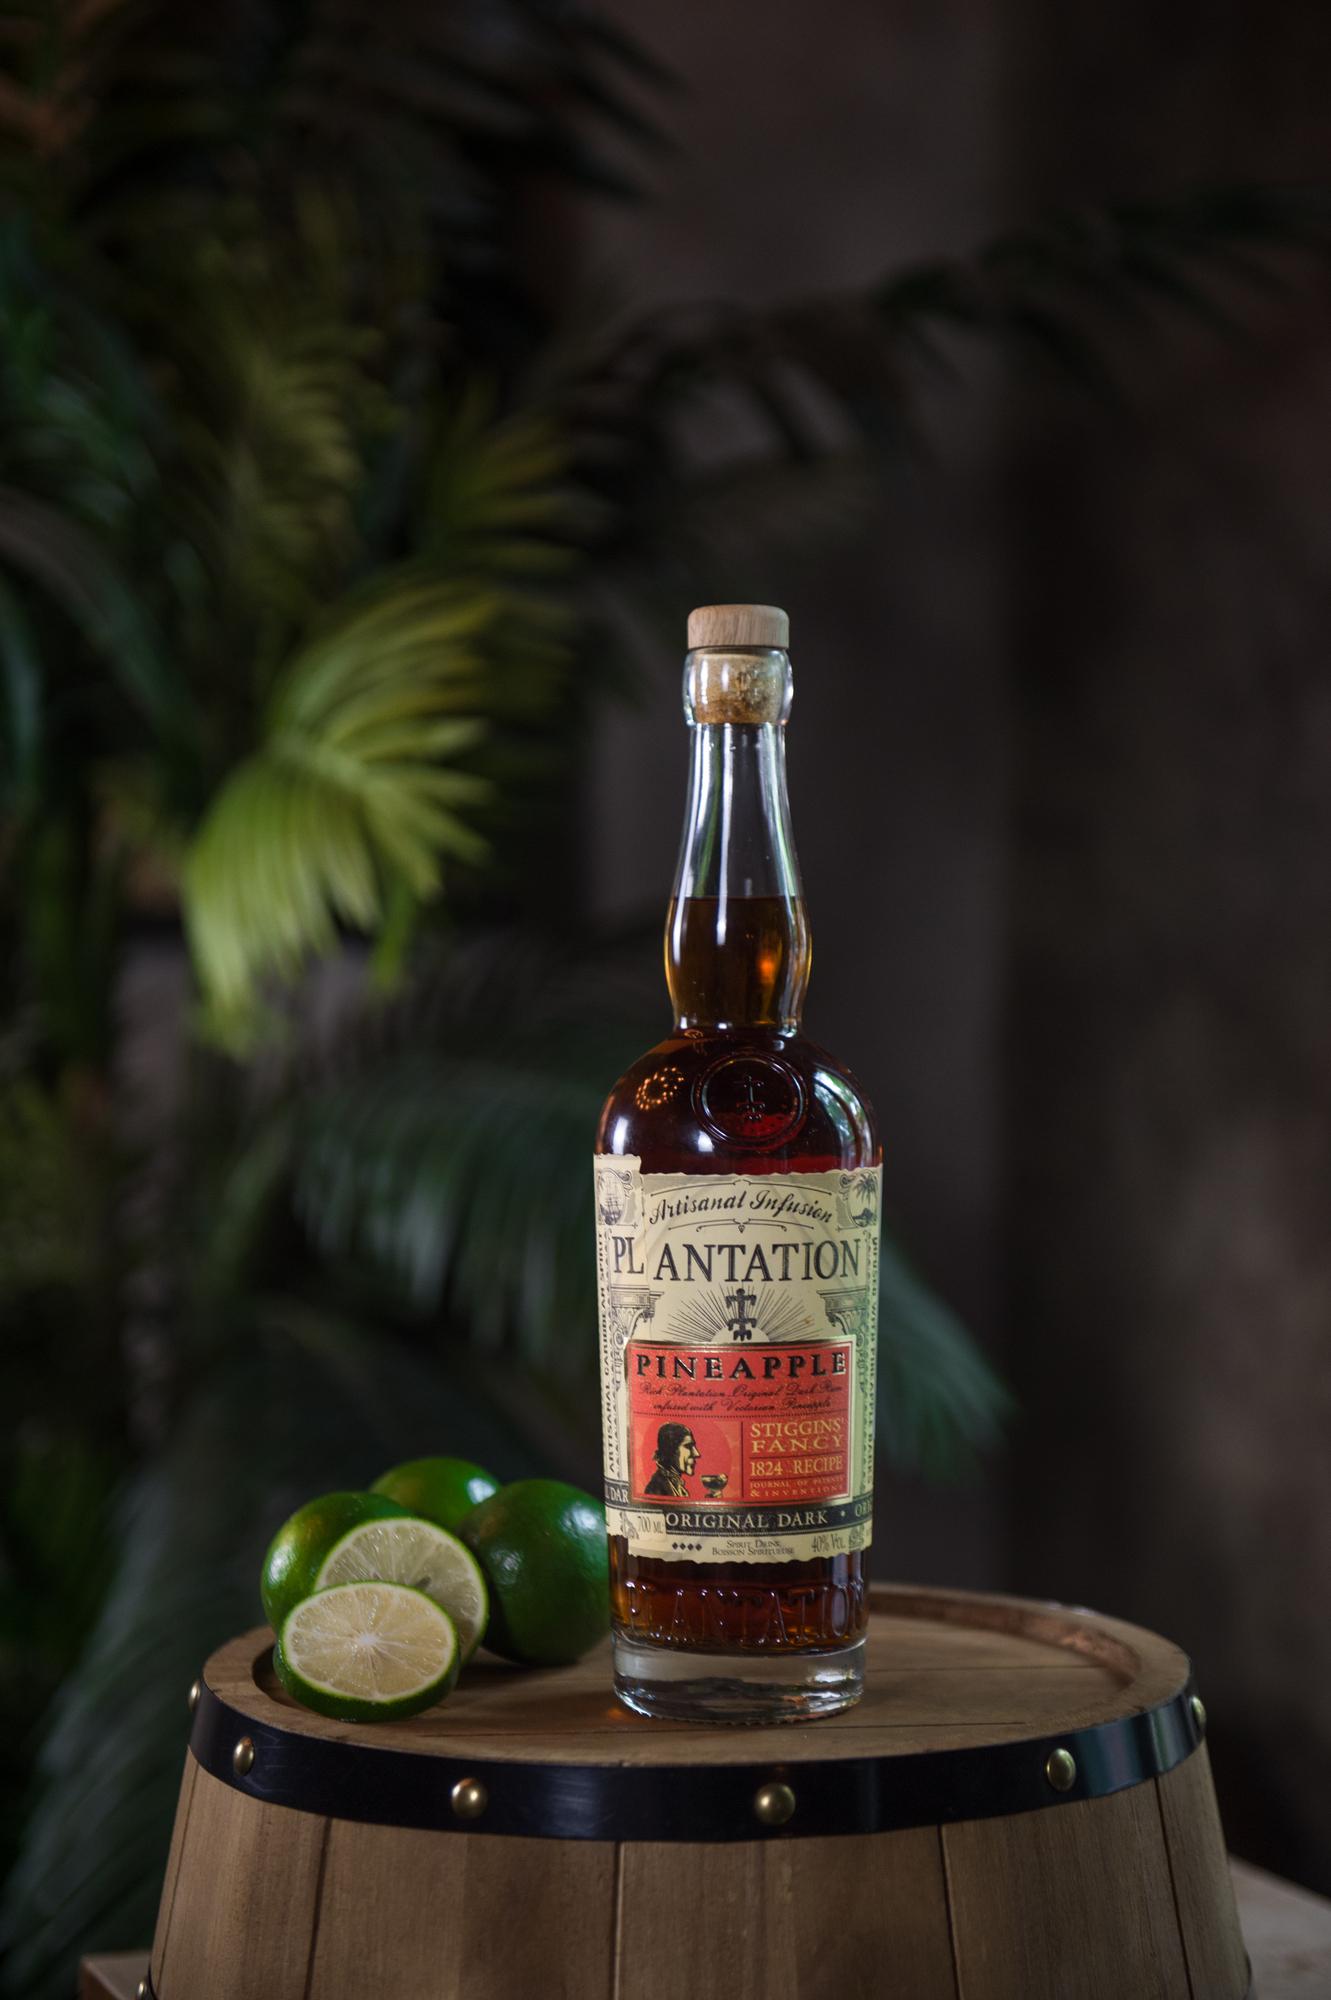 Plantation Stiggins Fancy Pineapple bottle